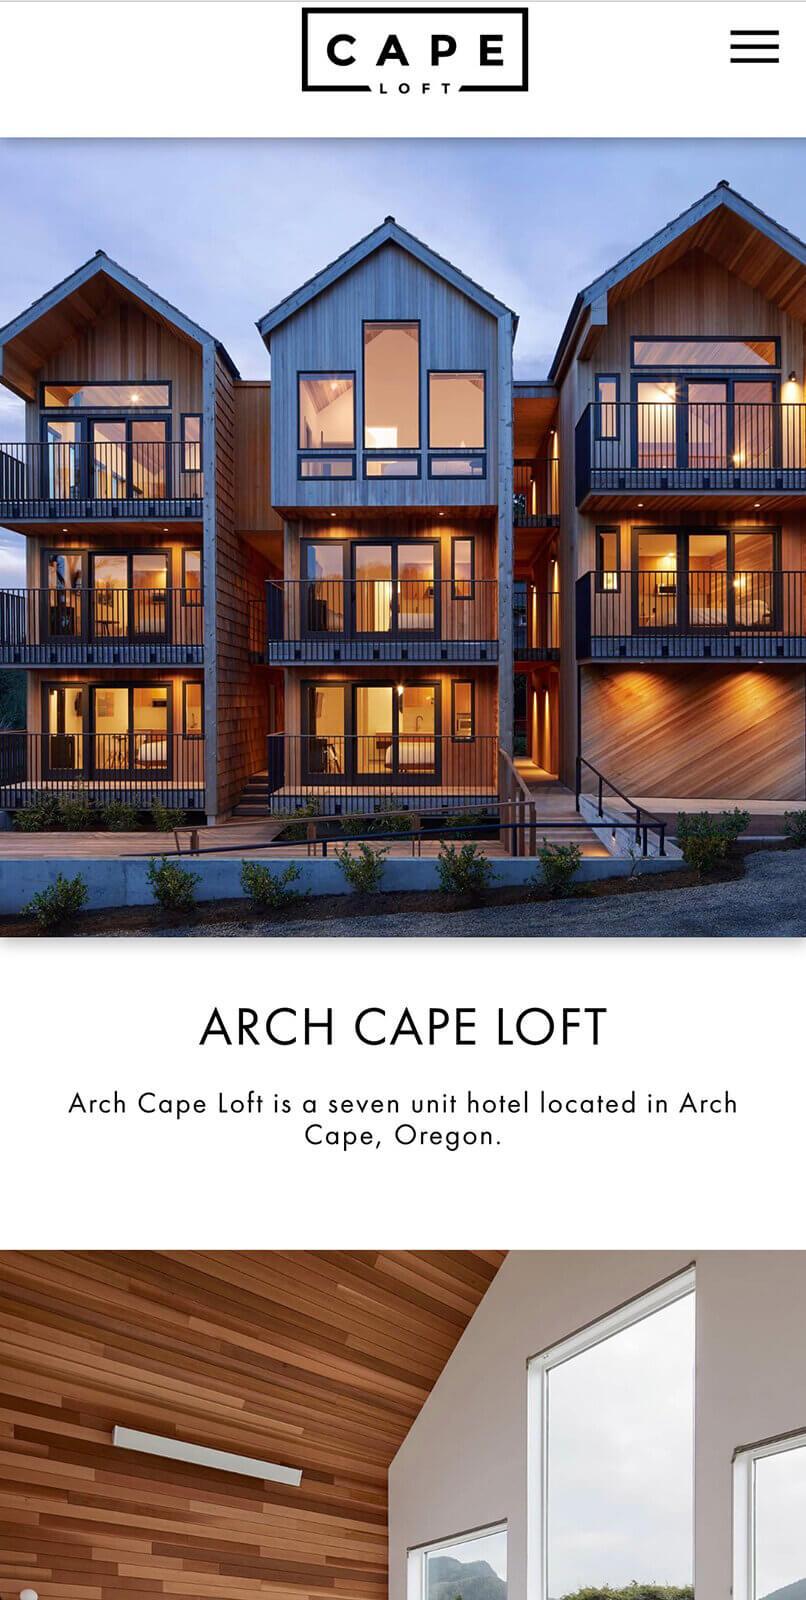 The cape loft in Arch Cape website